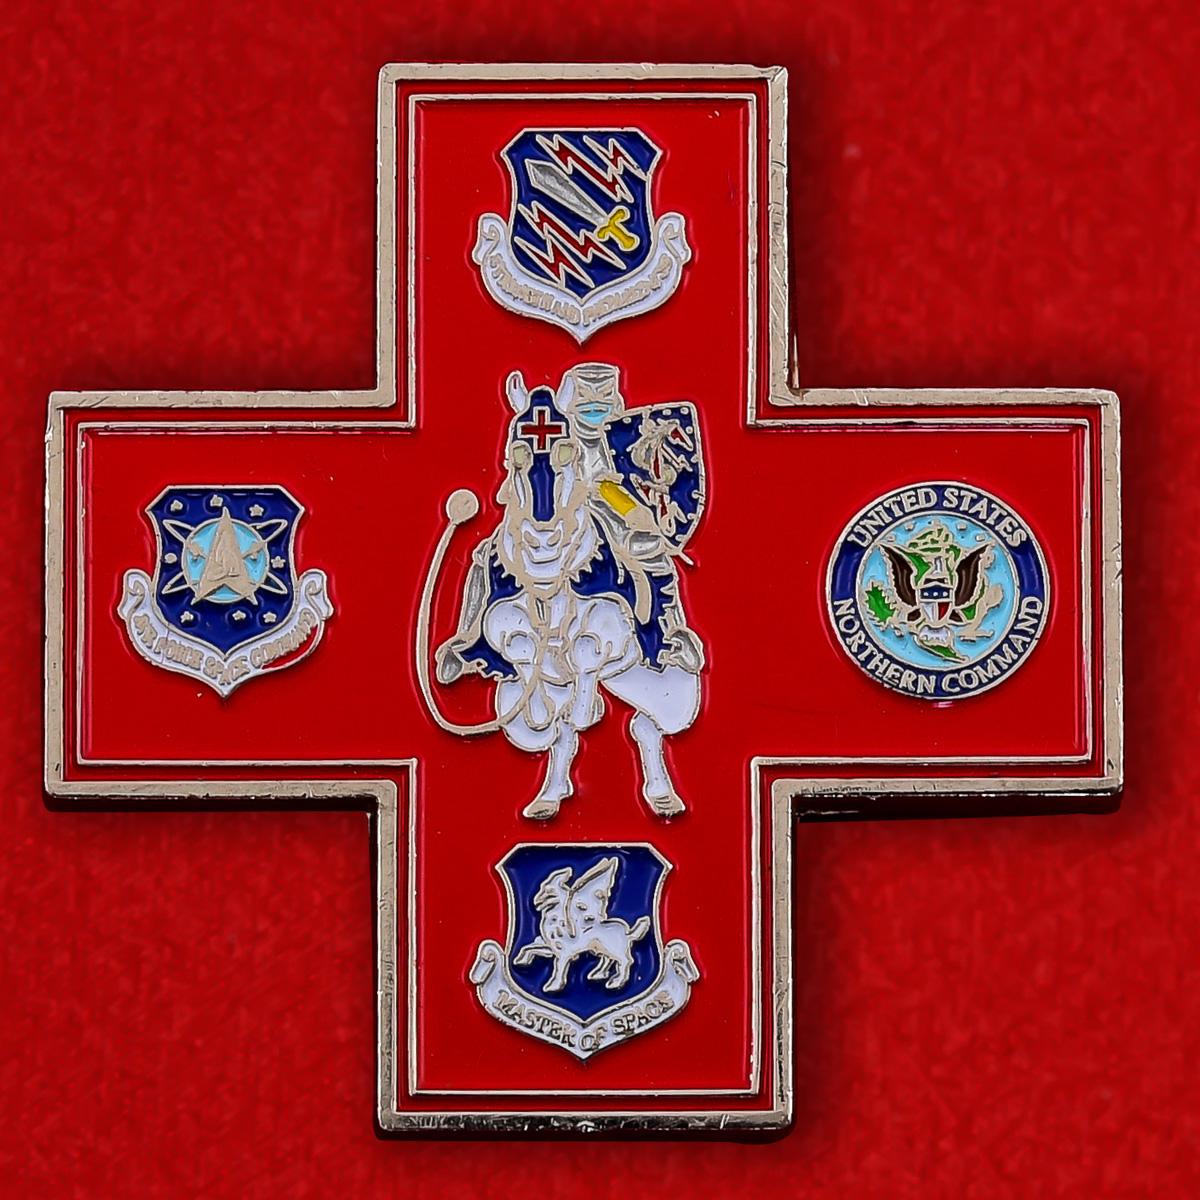 Челлендж коин 21-ой Медицинской группы авиабазы Петерсон